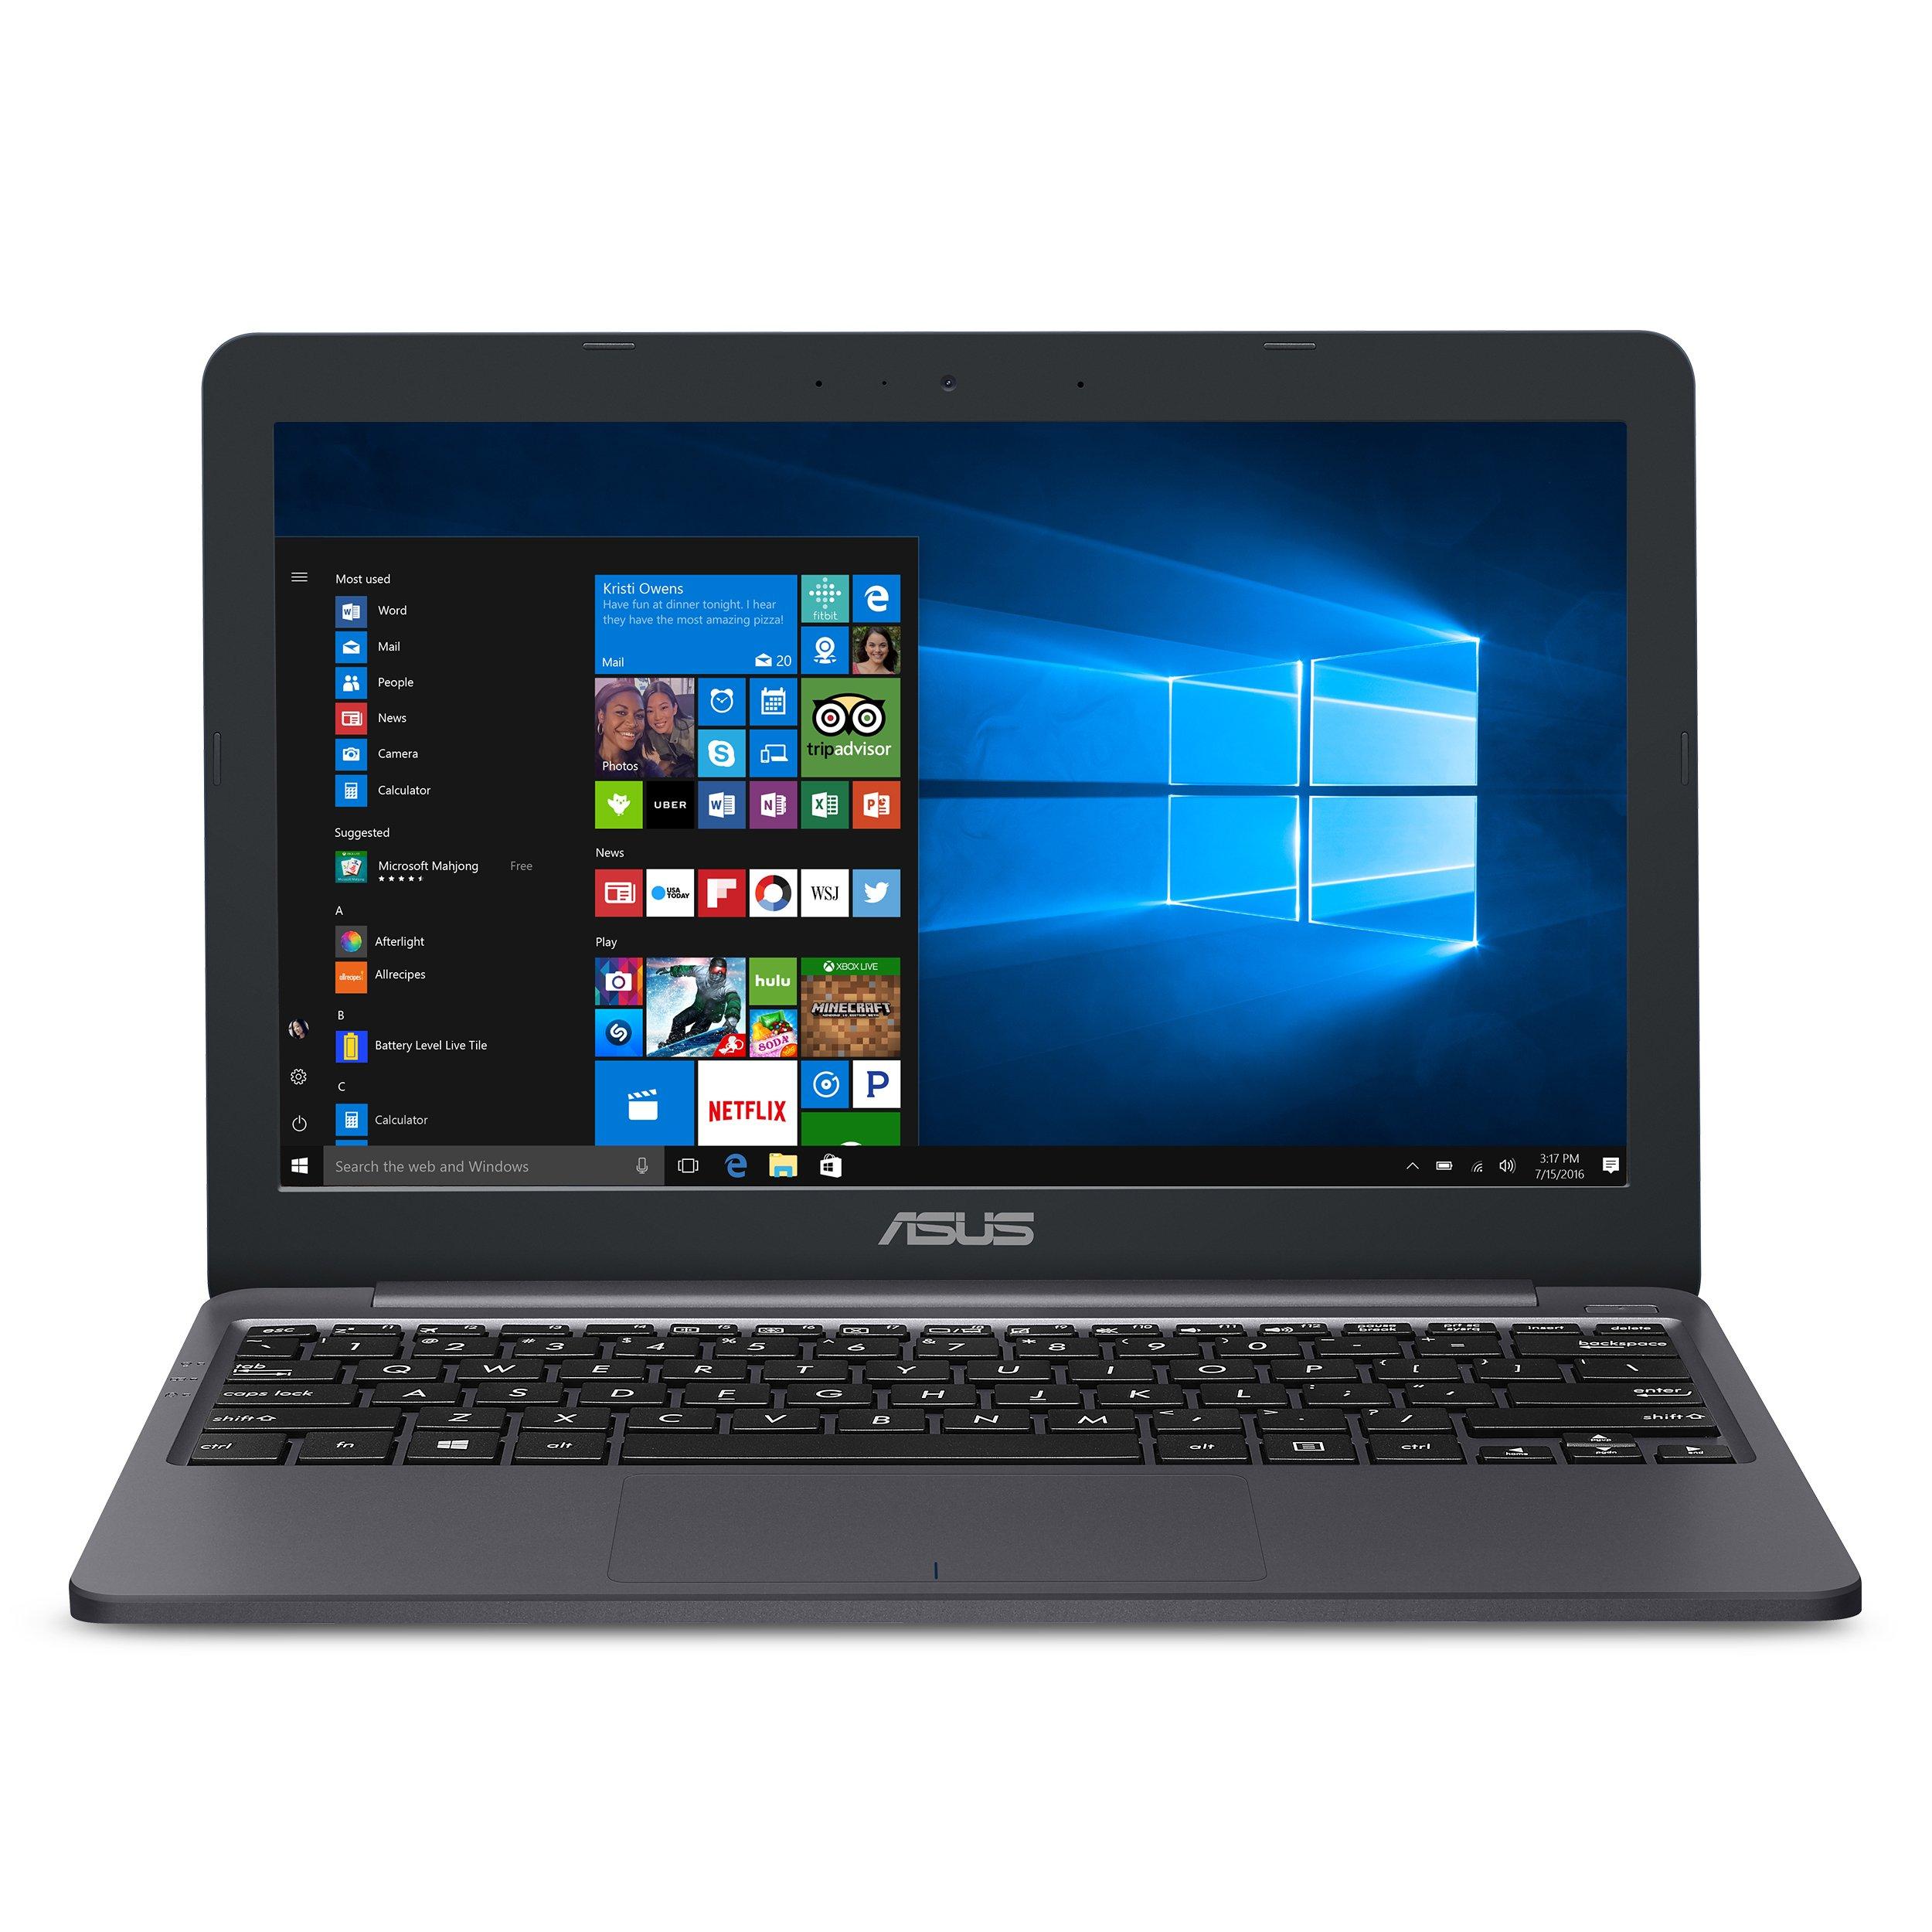 "ASUS VivoBook E203MA Ultra-Thin Laptop [2019 Version], Intel Celeron N4000 Processor (up to 2.6 GHz), 4GB LPDDR4, 64GB eMMC, 11.6"" HD, USB-C, Windows 10 S mode (Switchable to Pro), E203MA-YS03"